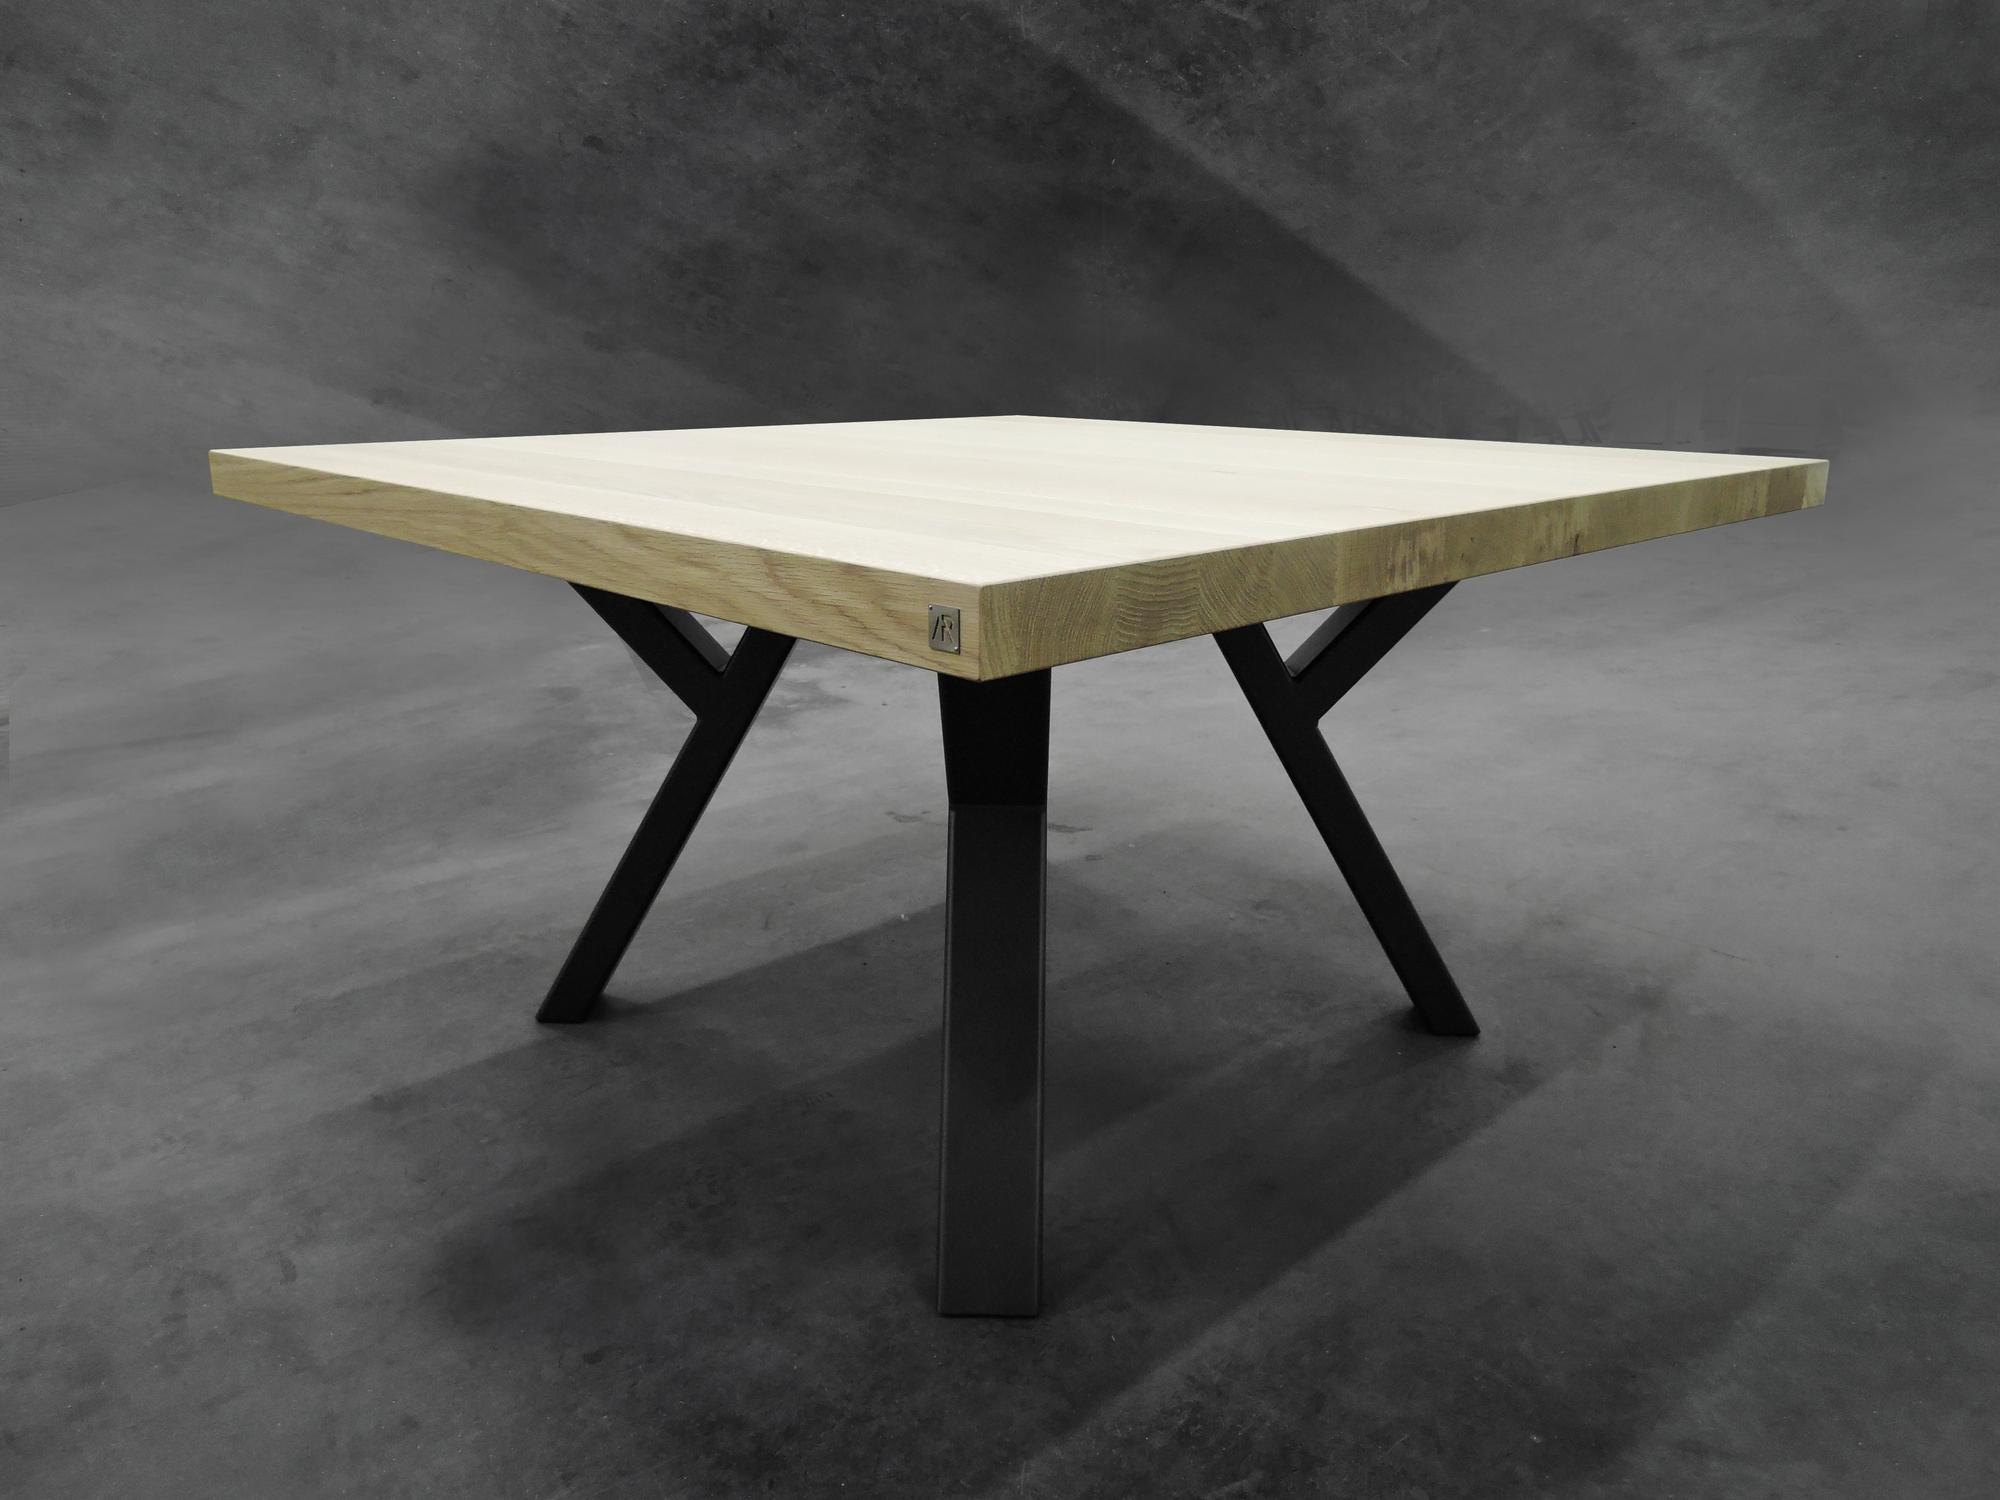 table ramage carr e m tal et bois massif fabrication artisanale. Black Bedroom Furniture Sets. Home Design Ideas